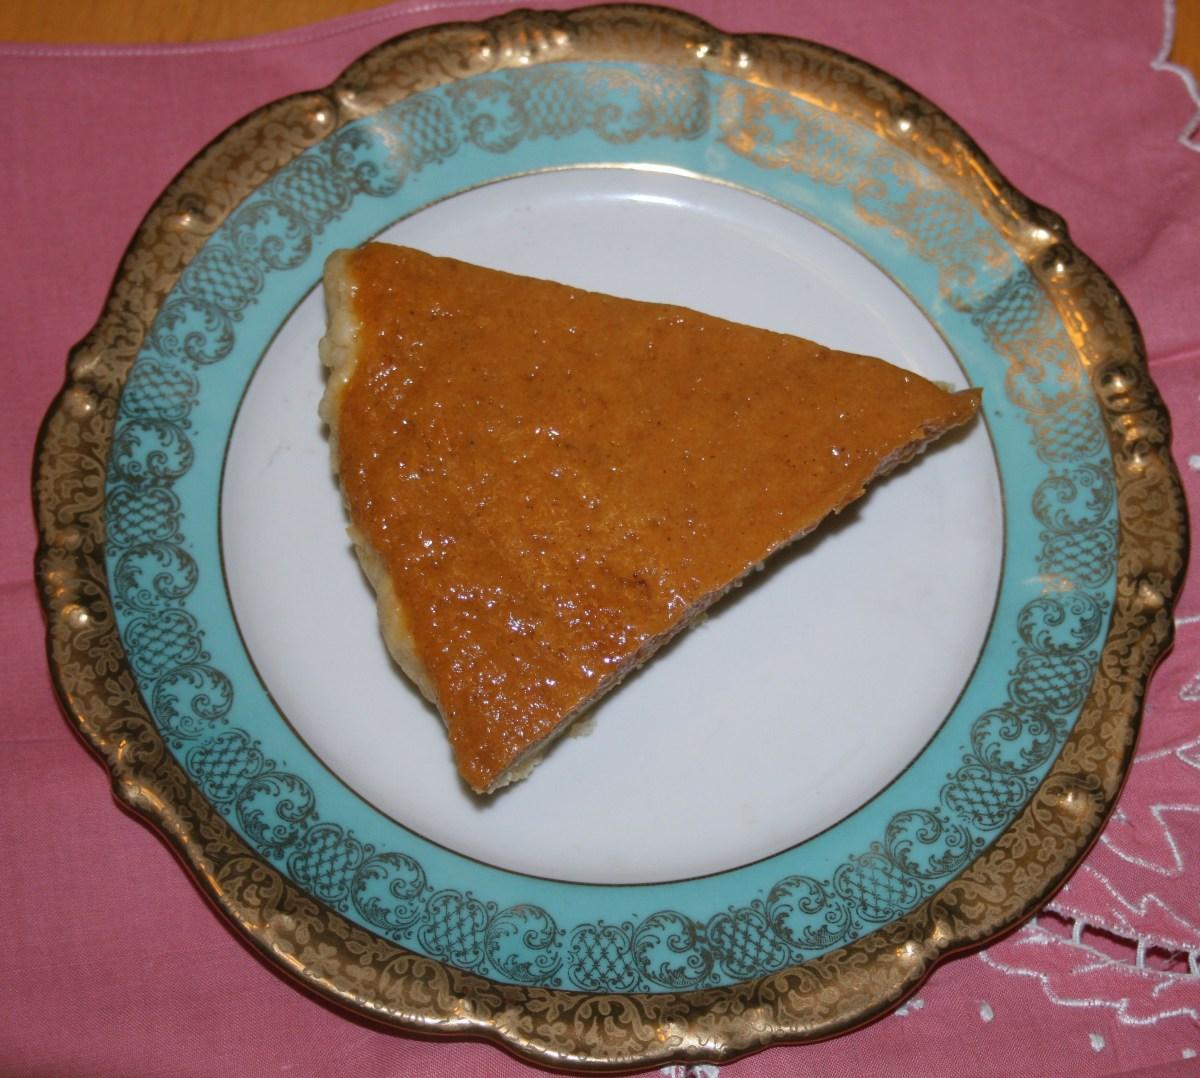 Here's Gin's Pumpkin Chiffon Pie in a pie crust made with vinegar.